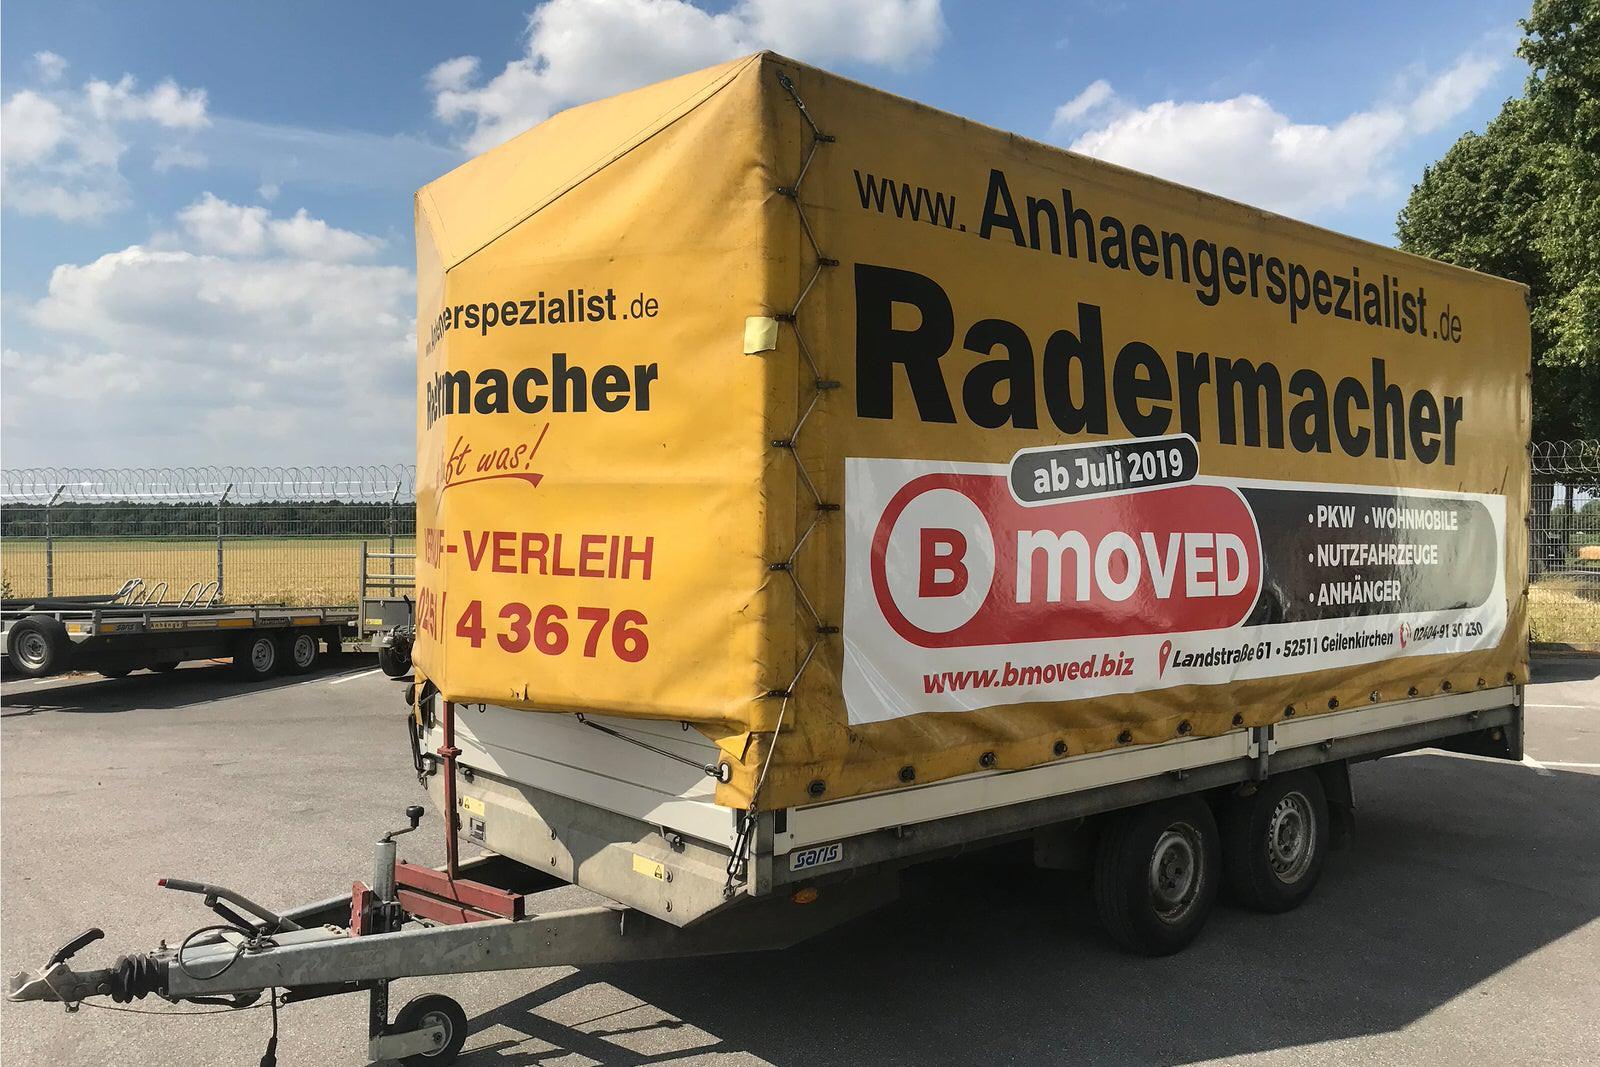 Transporter Mieten Aachen : plananh nger 5m b moved ~ A.2002-acura-tl-radio.info Haus und Dekorationen